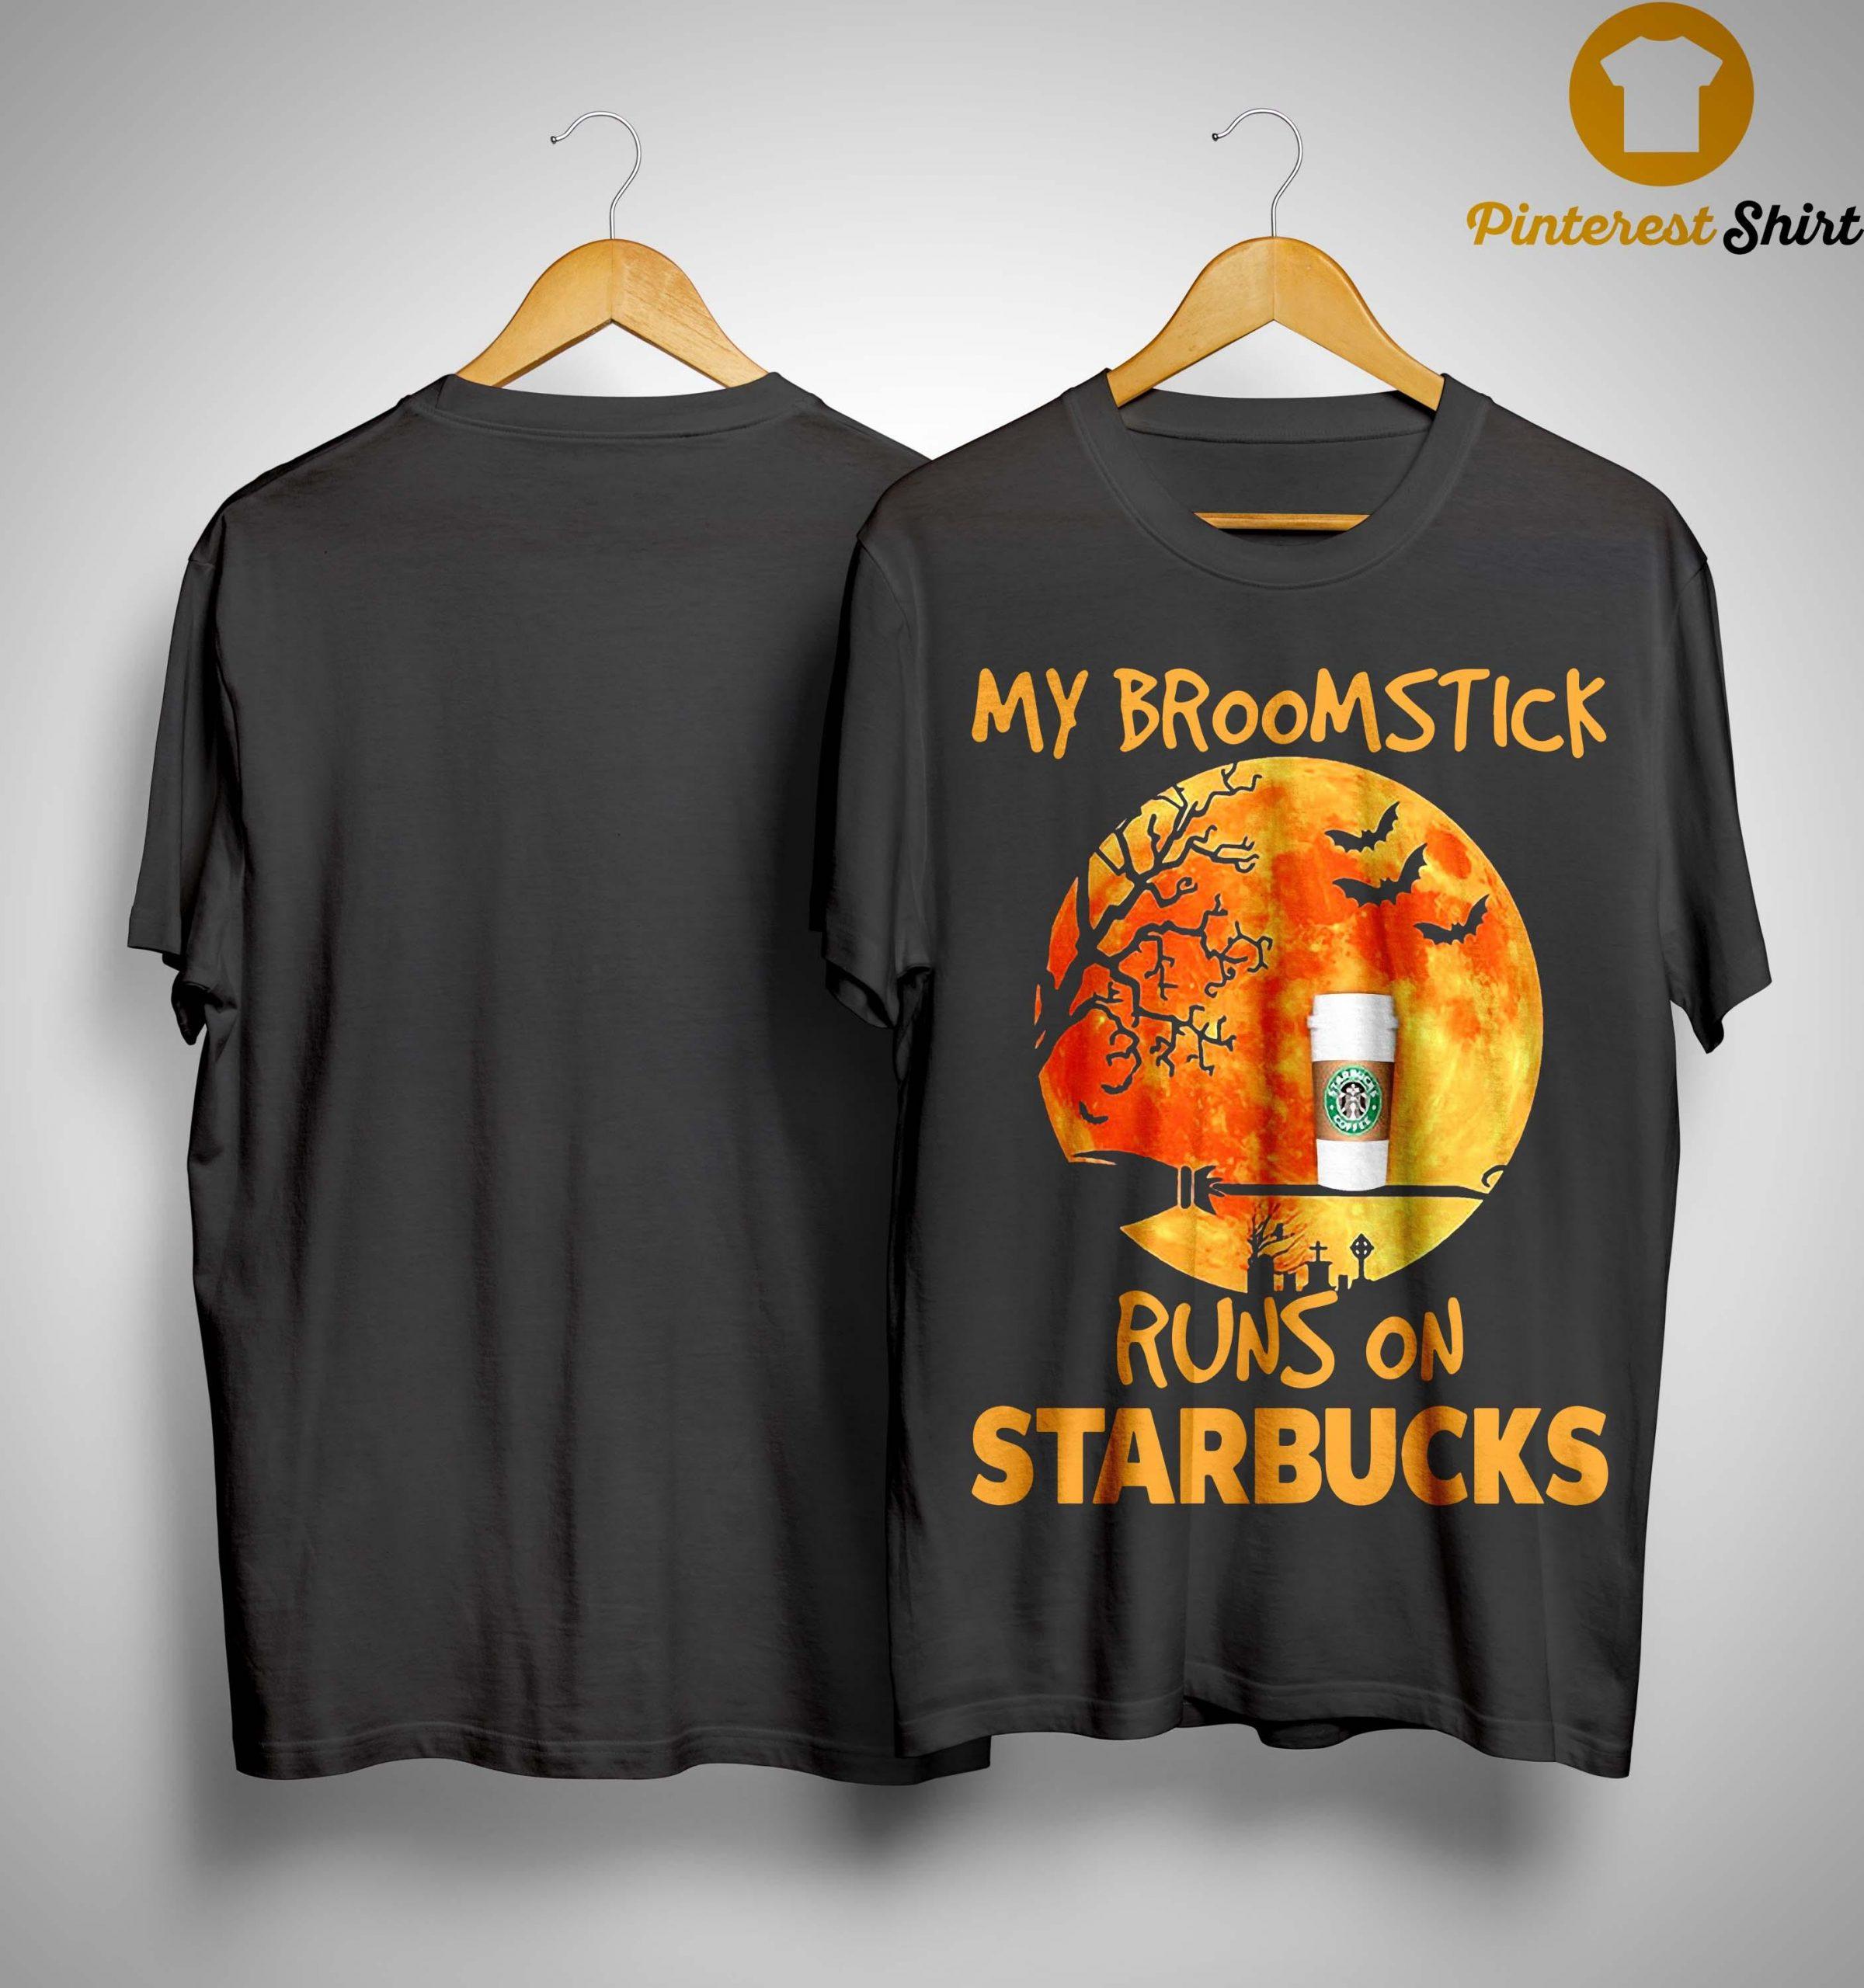 My Broomstick Runs On Starbucks Shirt